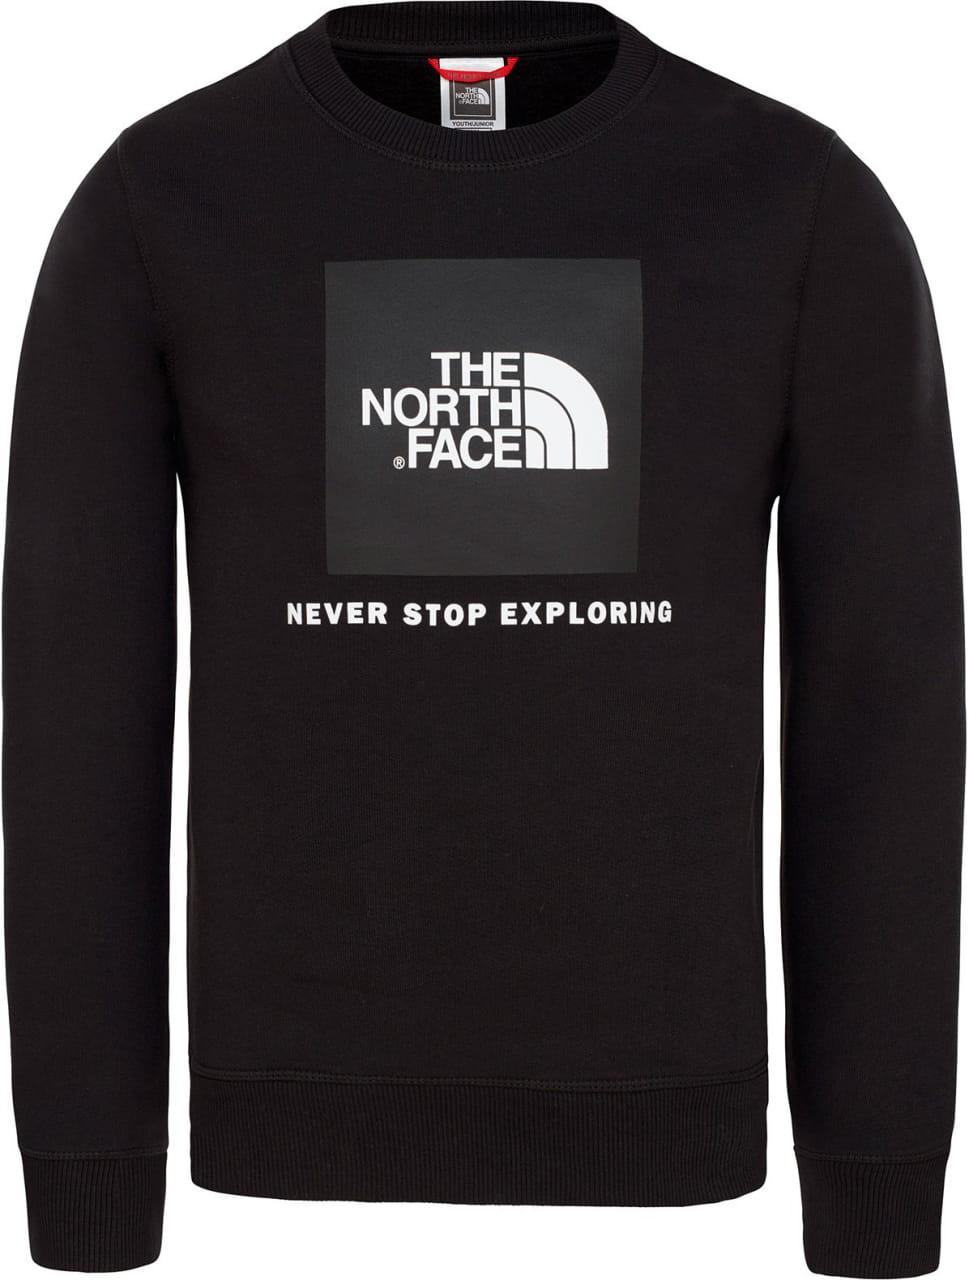 Dětský svetr The North Face Youth Box Drew Peak Pullover